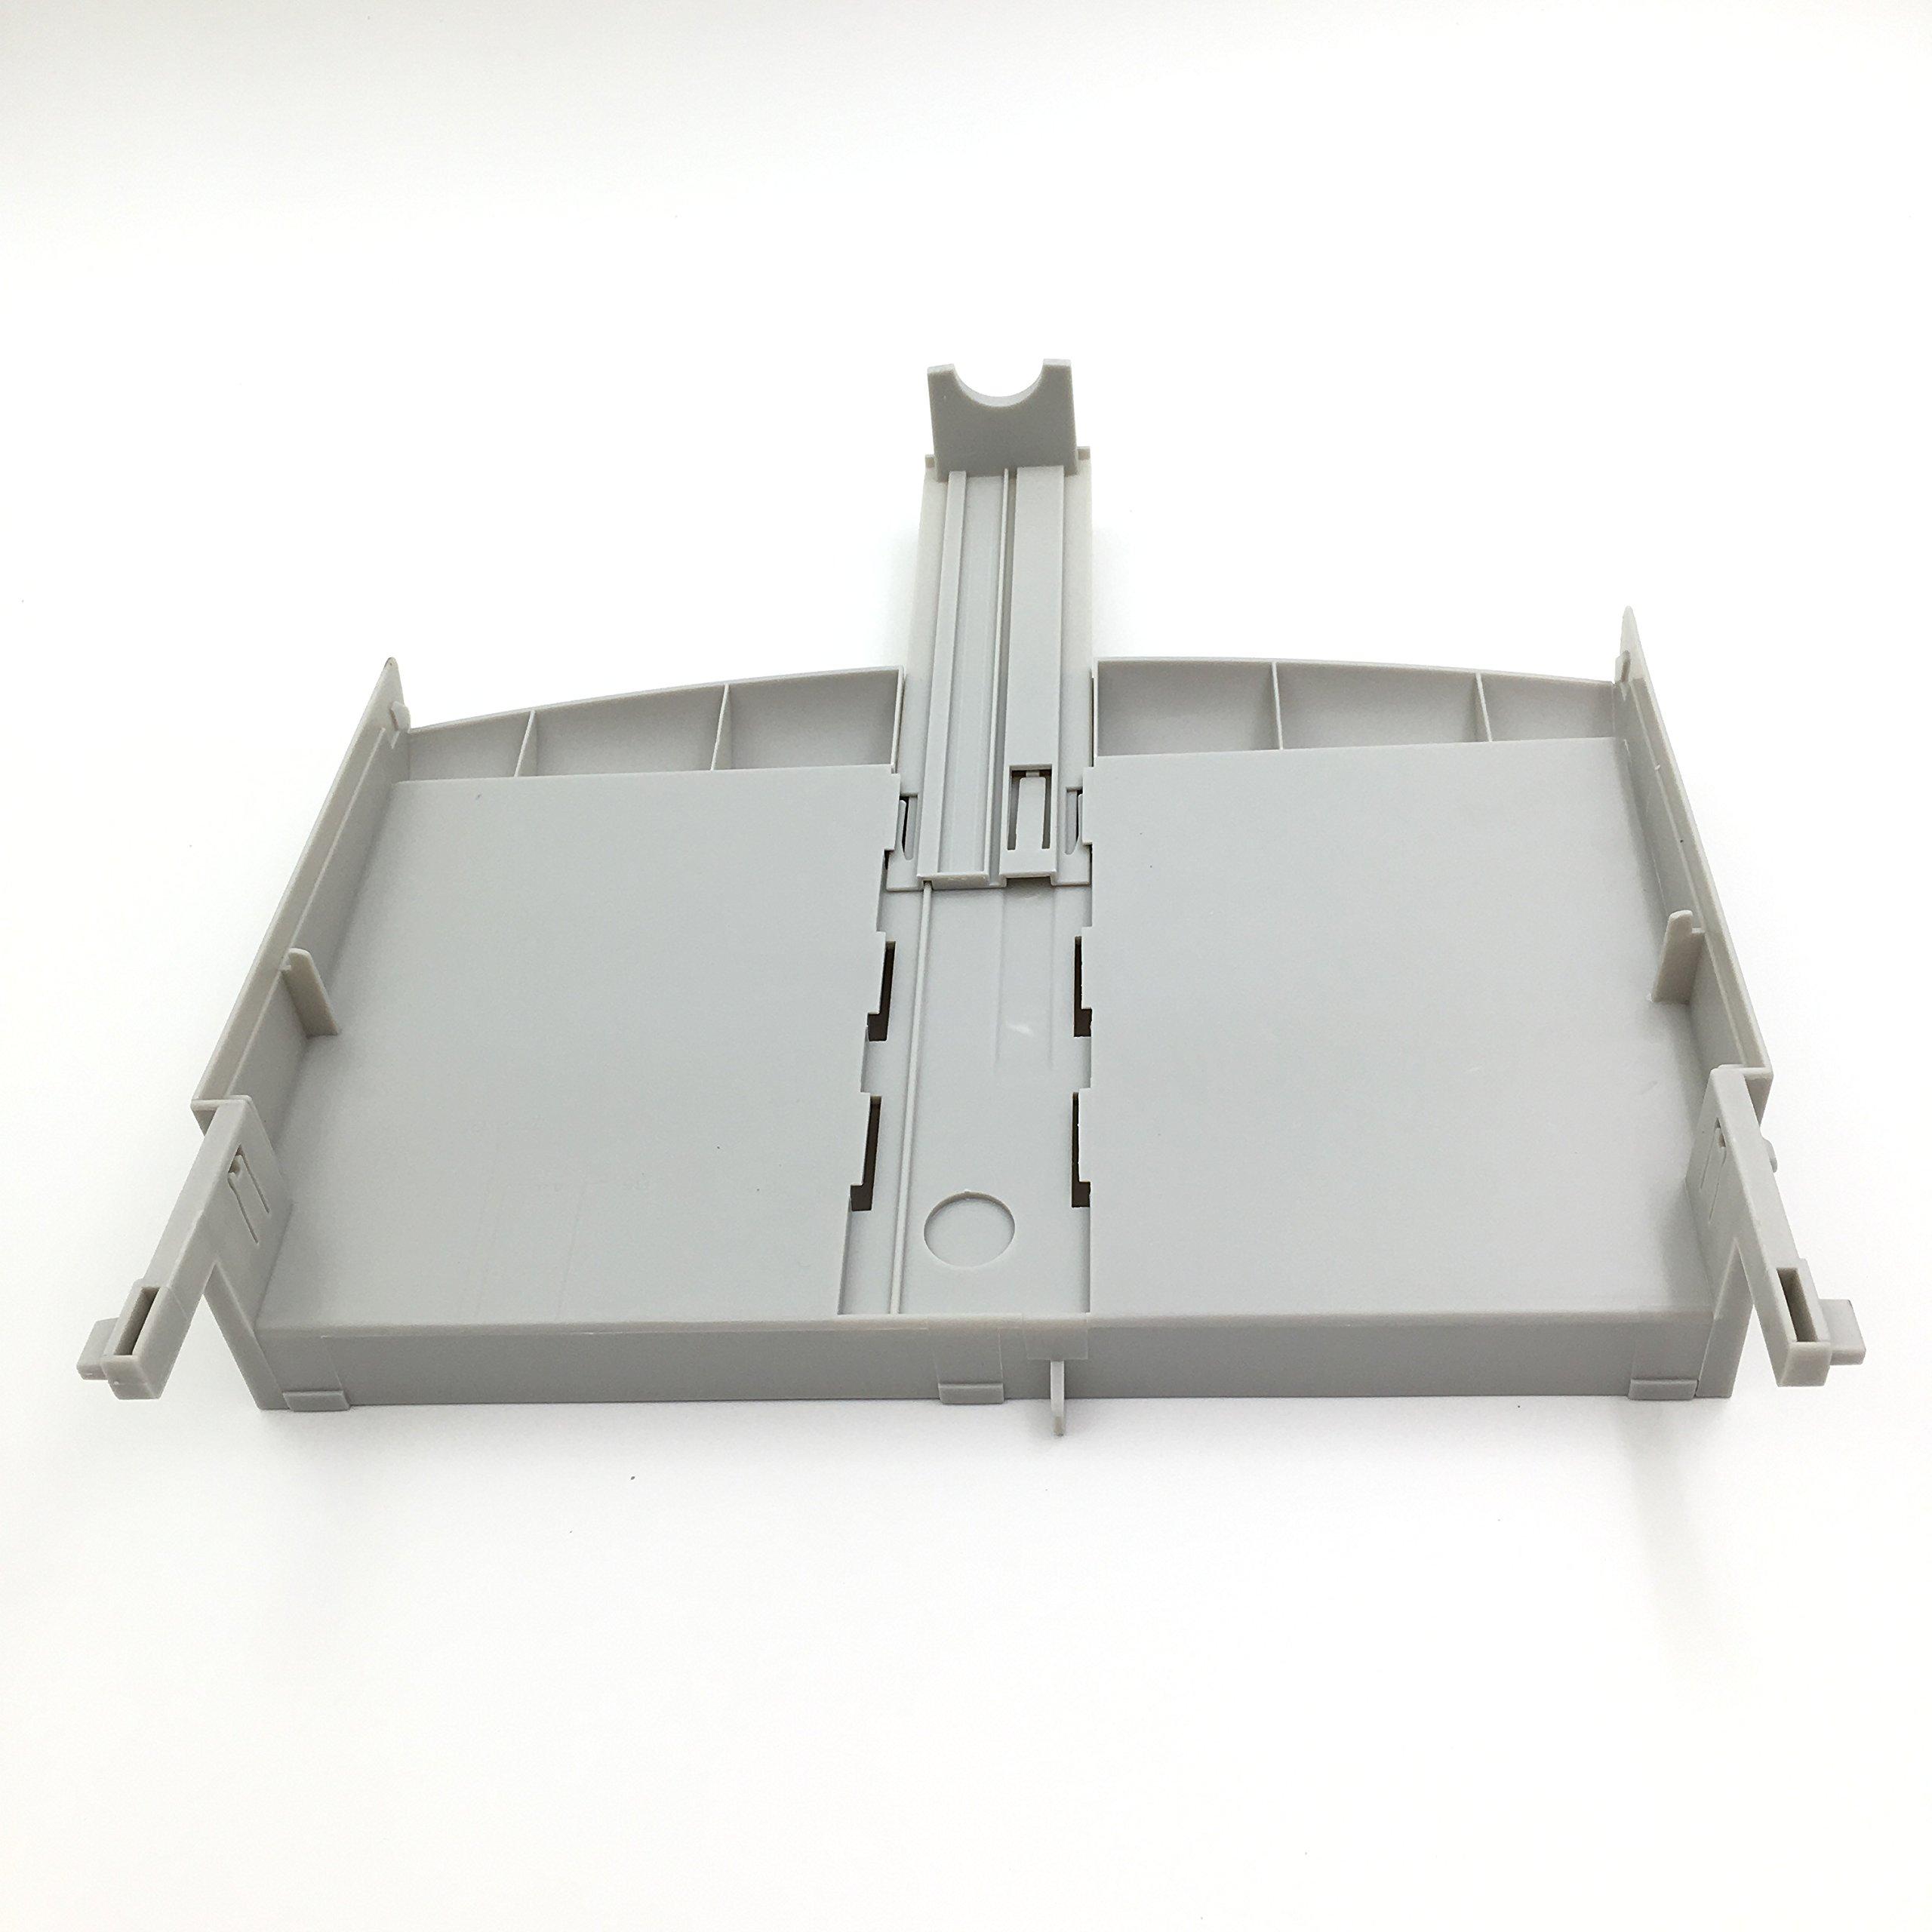 OKLILI RG0-1121-000 RG0-1013-000 RM1-0553 RM1-0554 Paper Input Tray for HP 1000 1200 1220 1300 1150 3300 3310 3320 3330 3380 by OKLILI (Image #1)